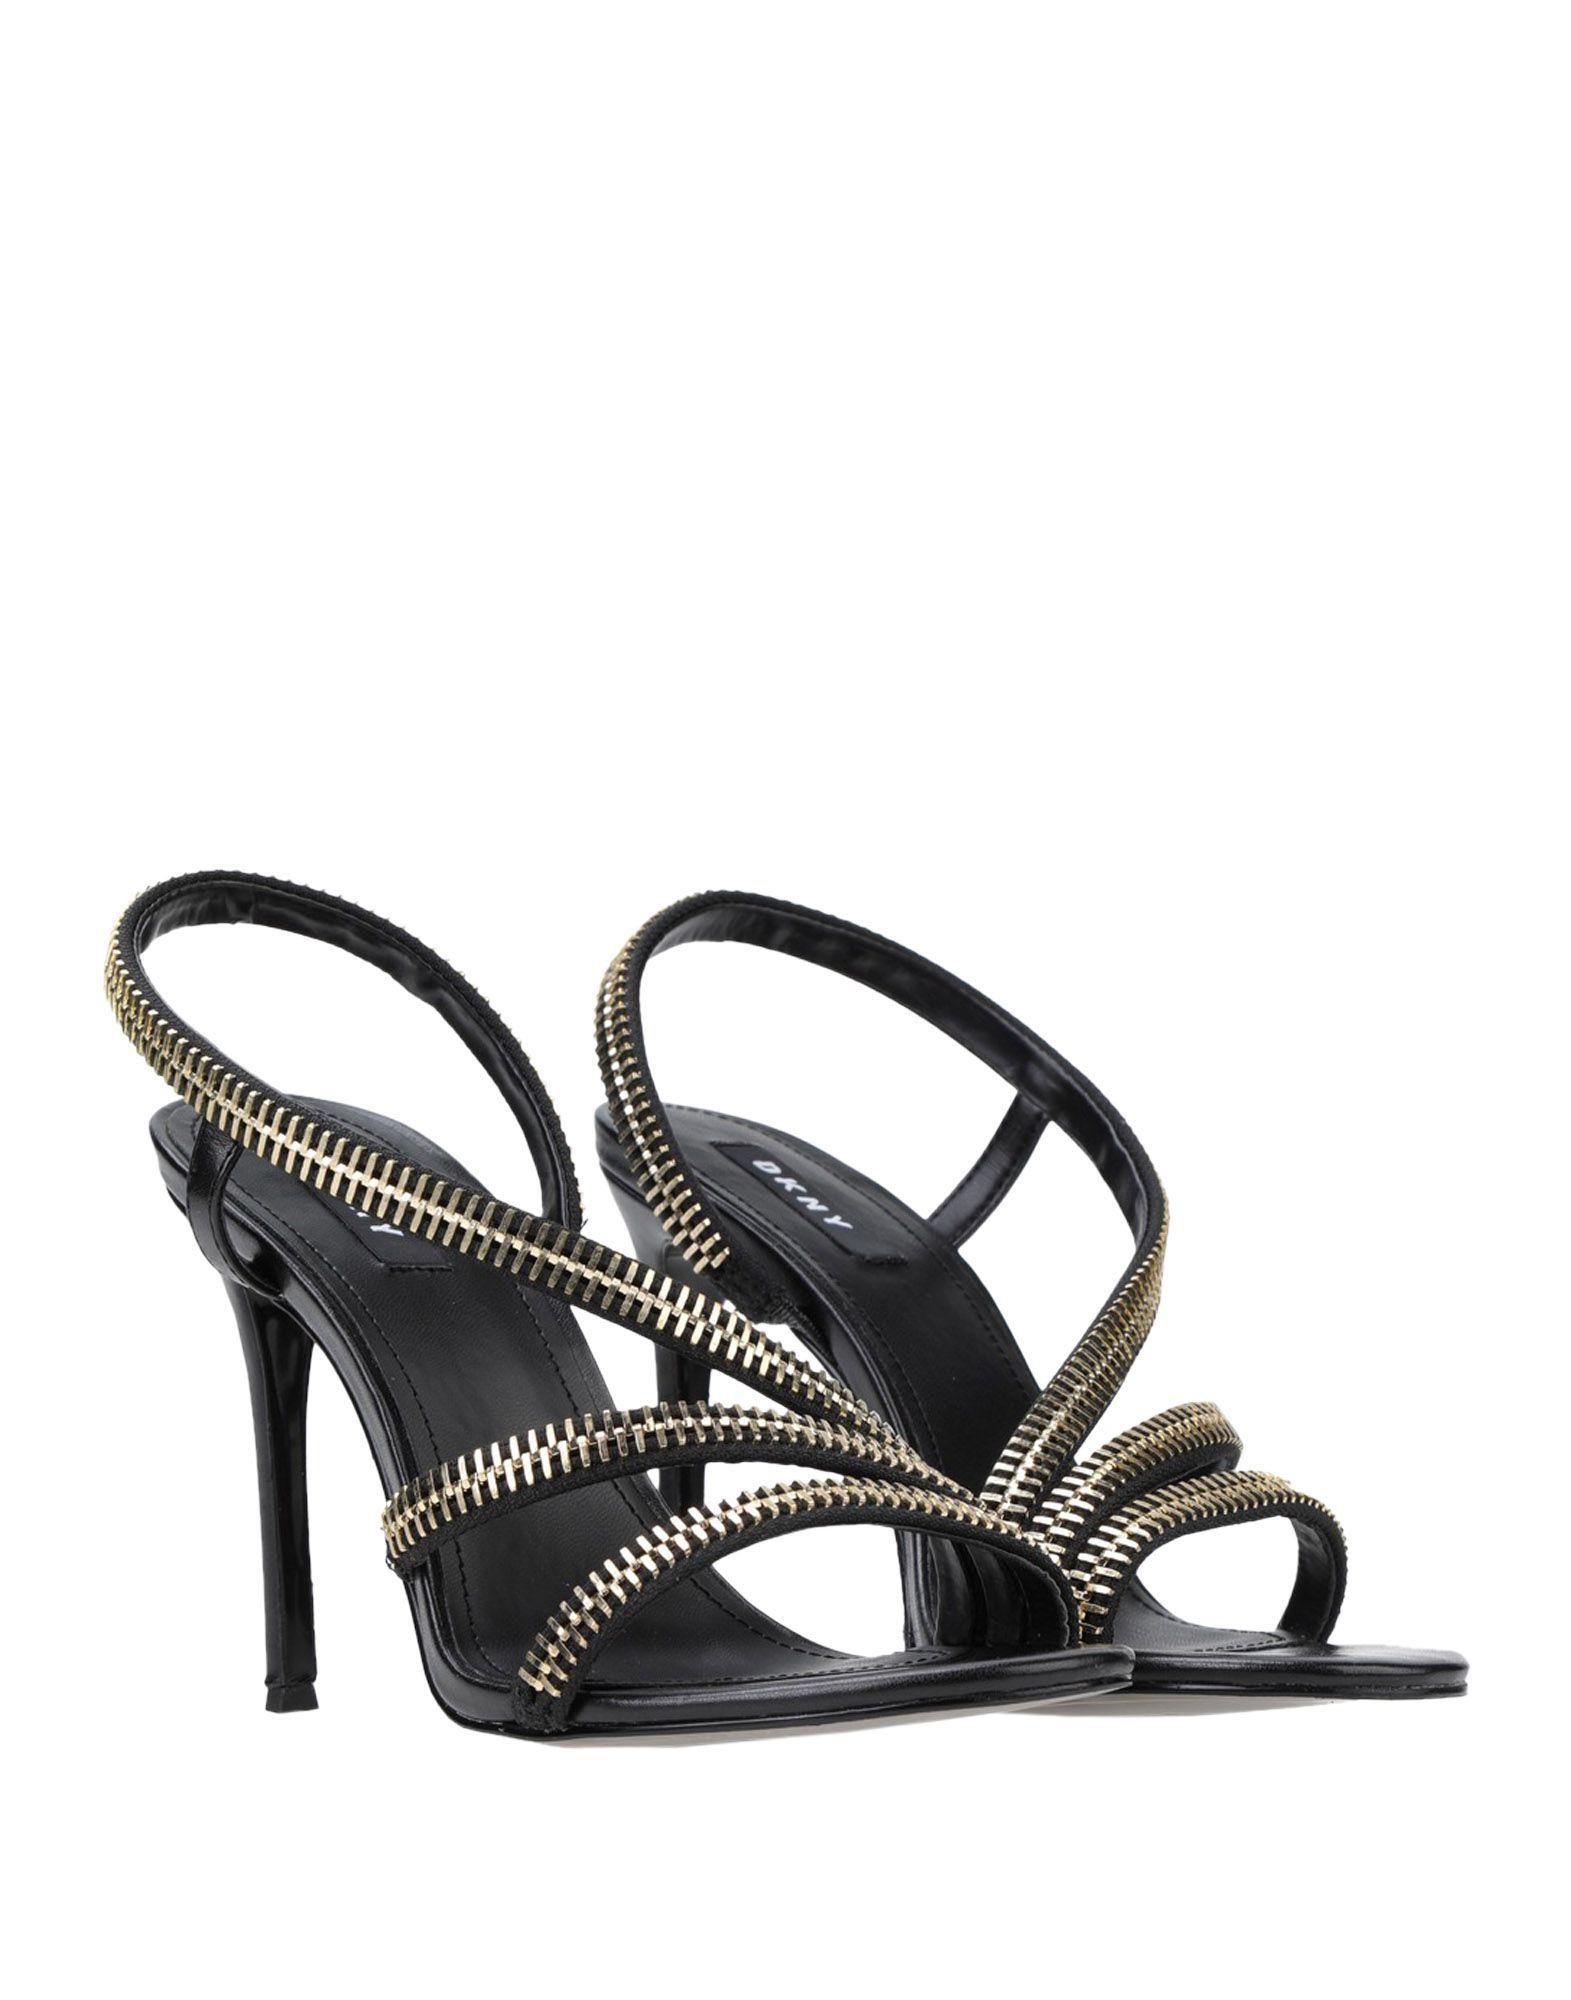 DKNY Sandals - Footwear   YOOX.COM